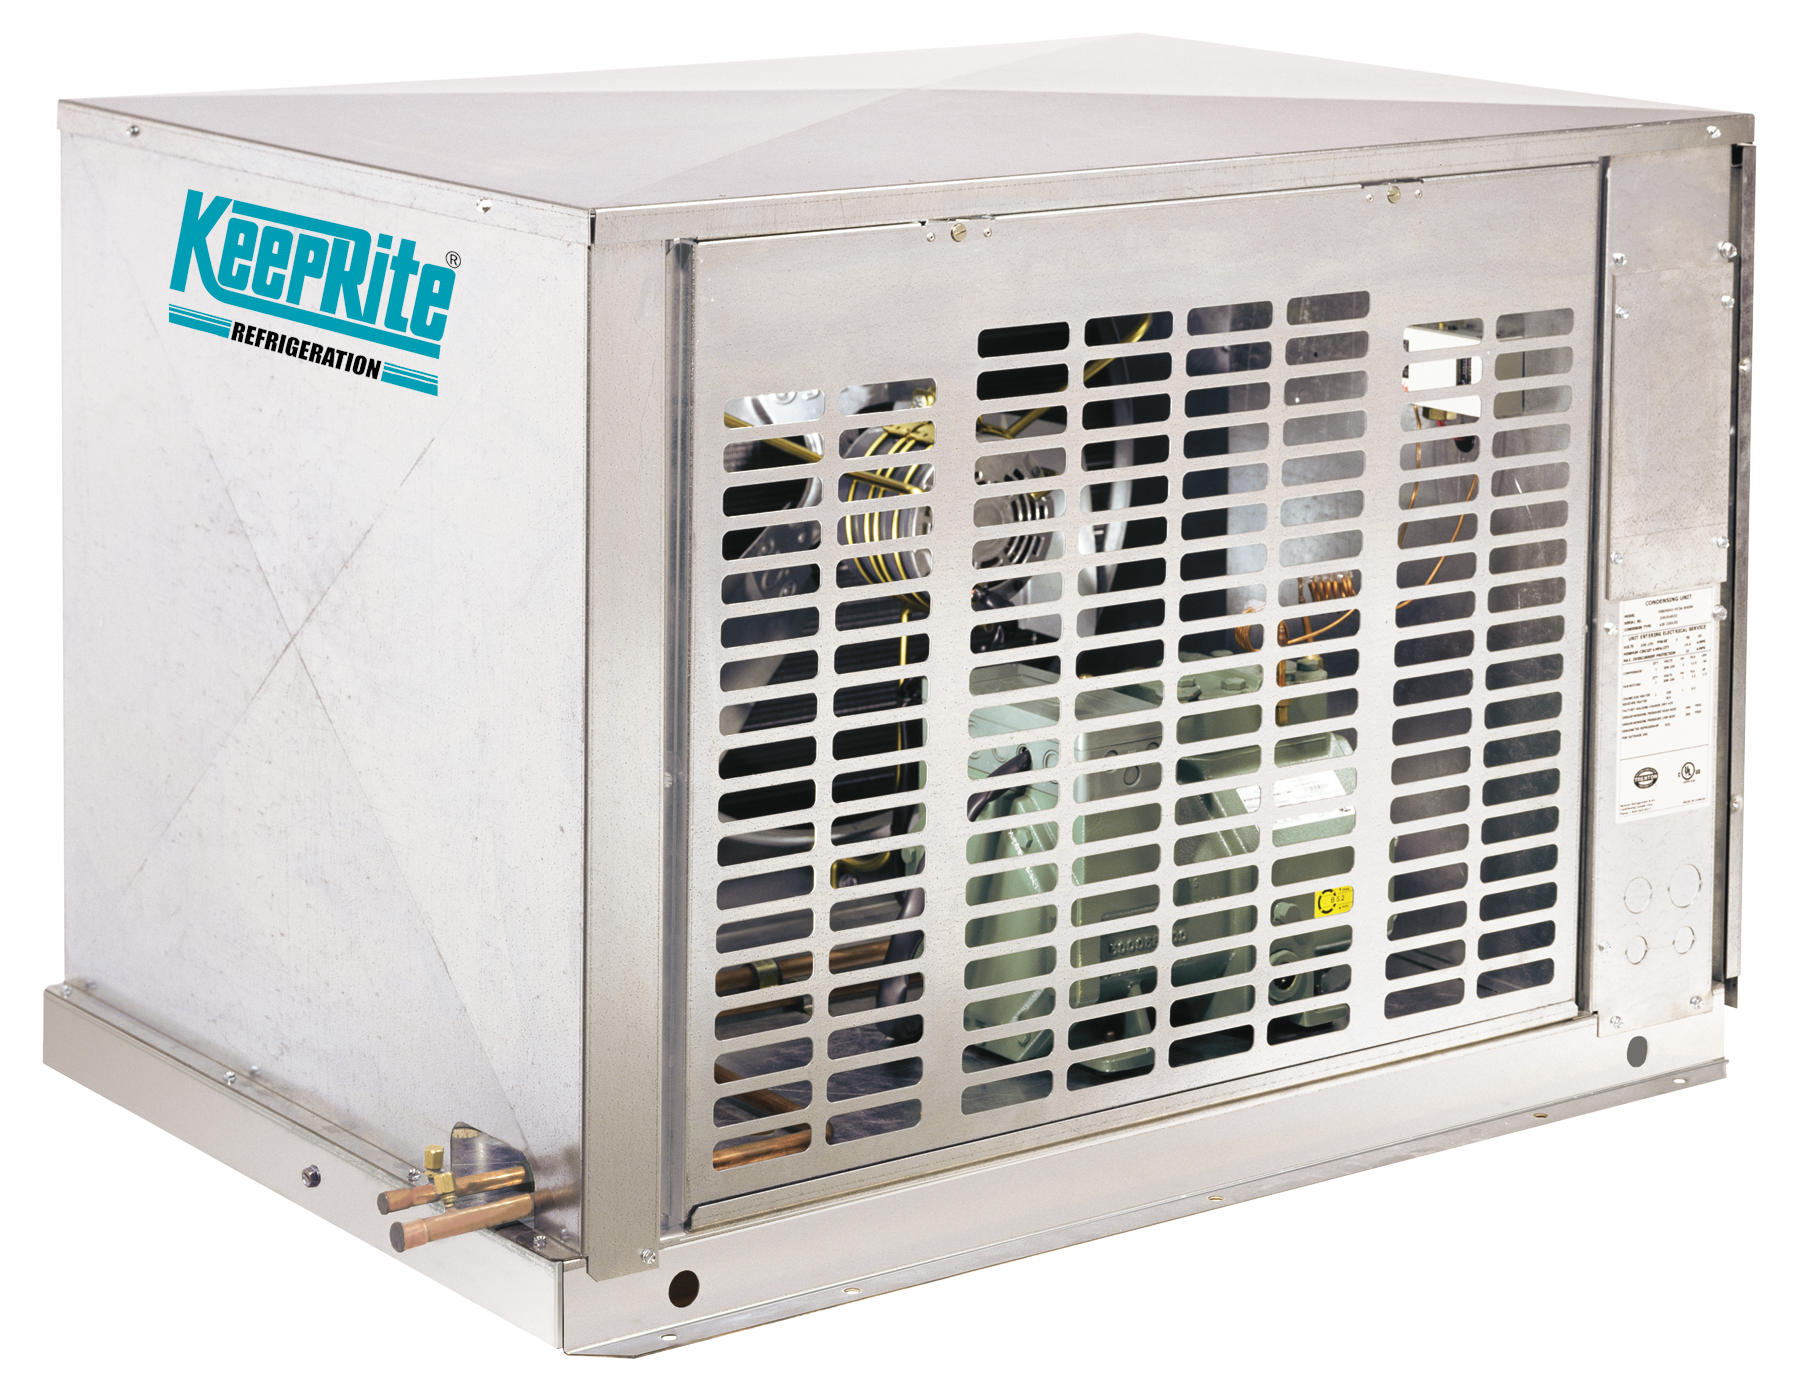 Air Cooled Semi Hermetic Condensing Units Keeprite Refrigeration #079BB2